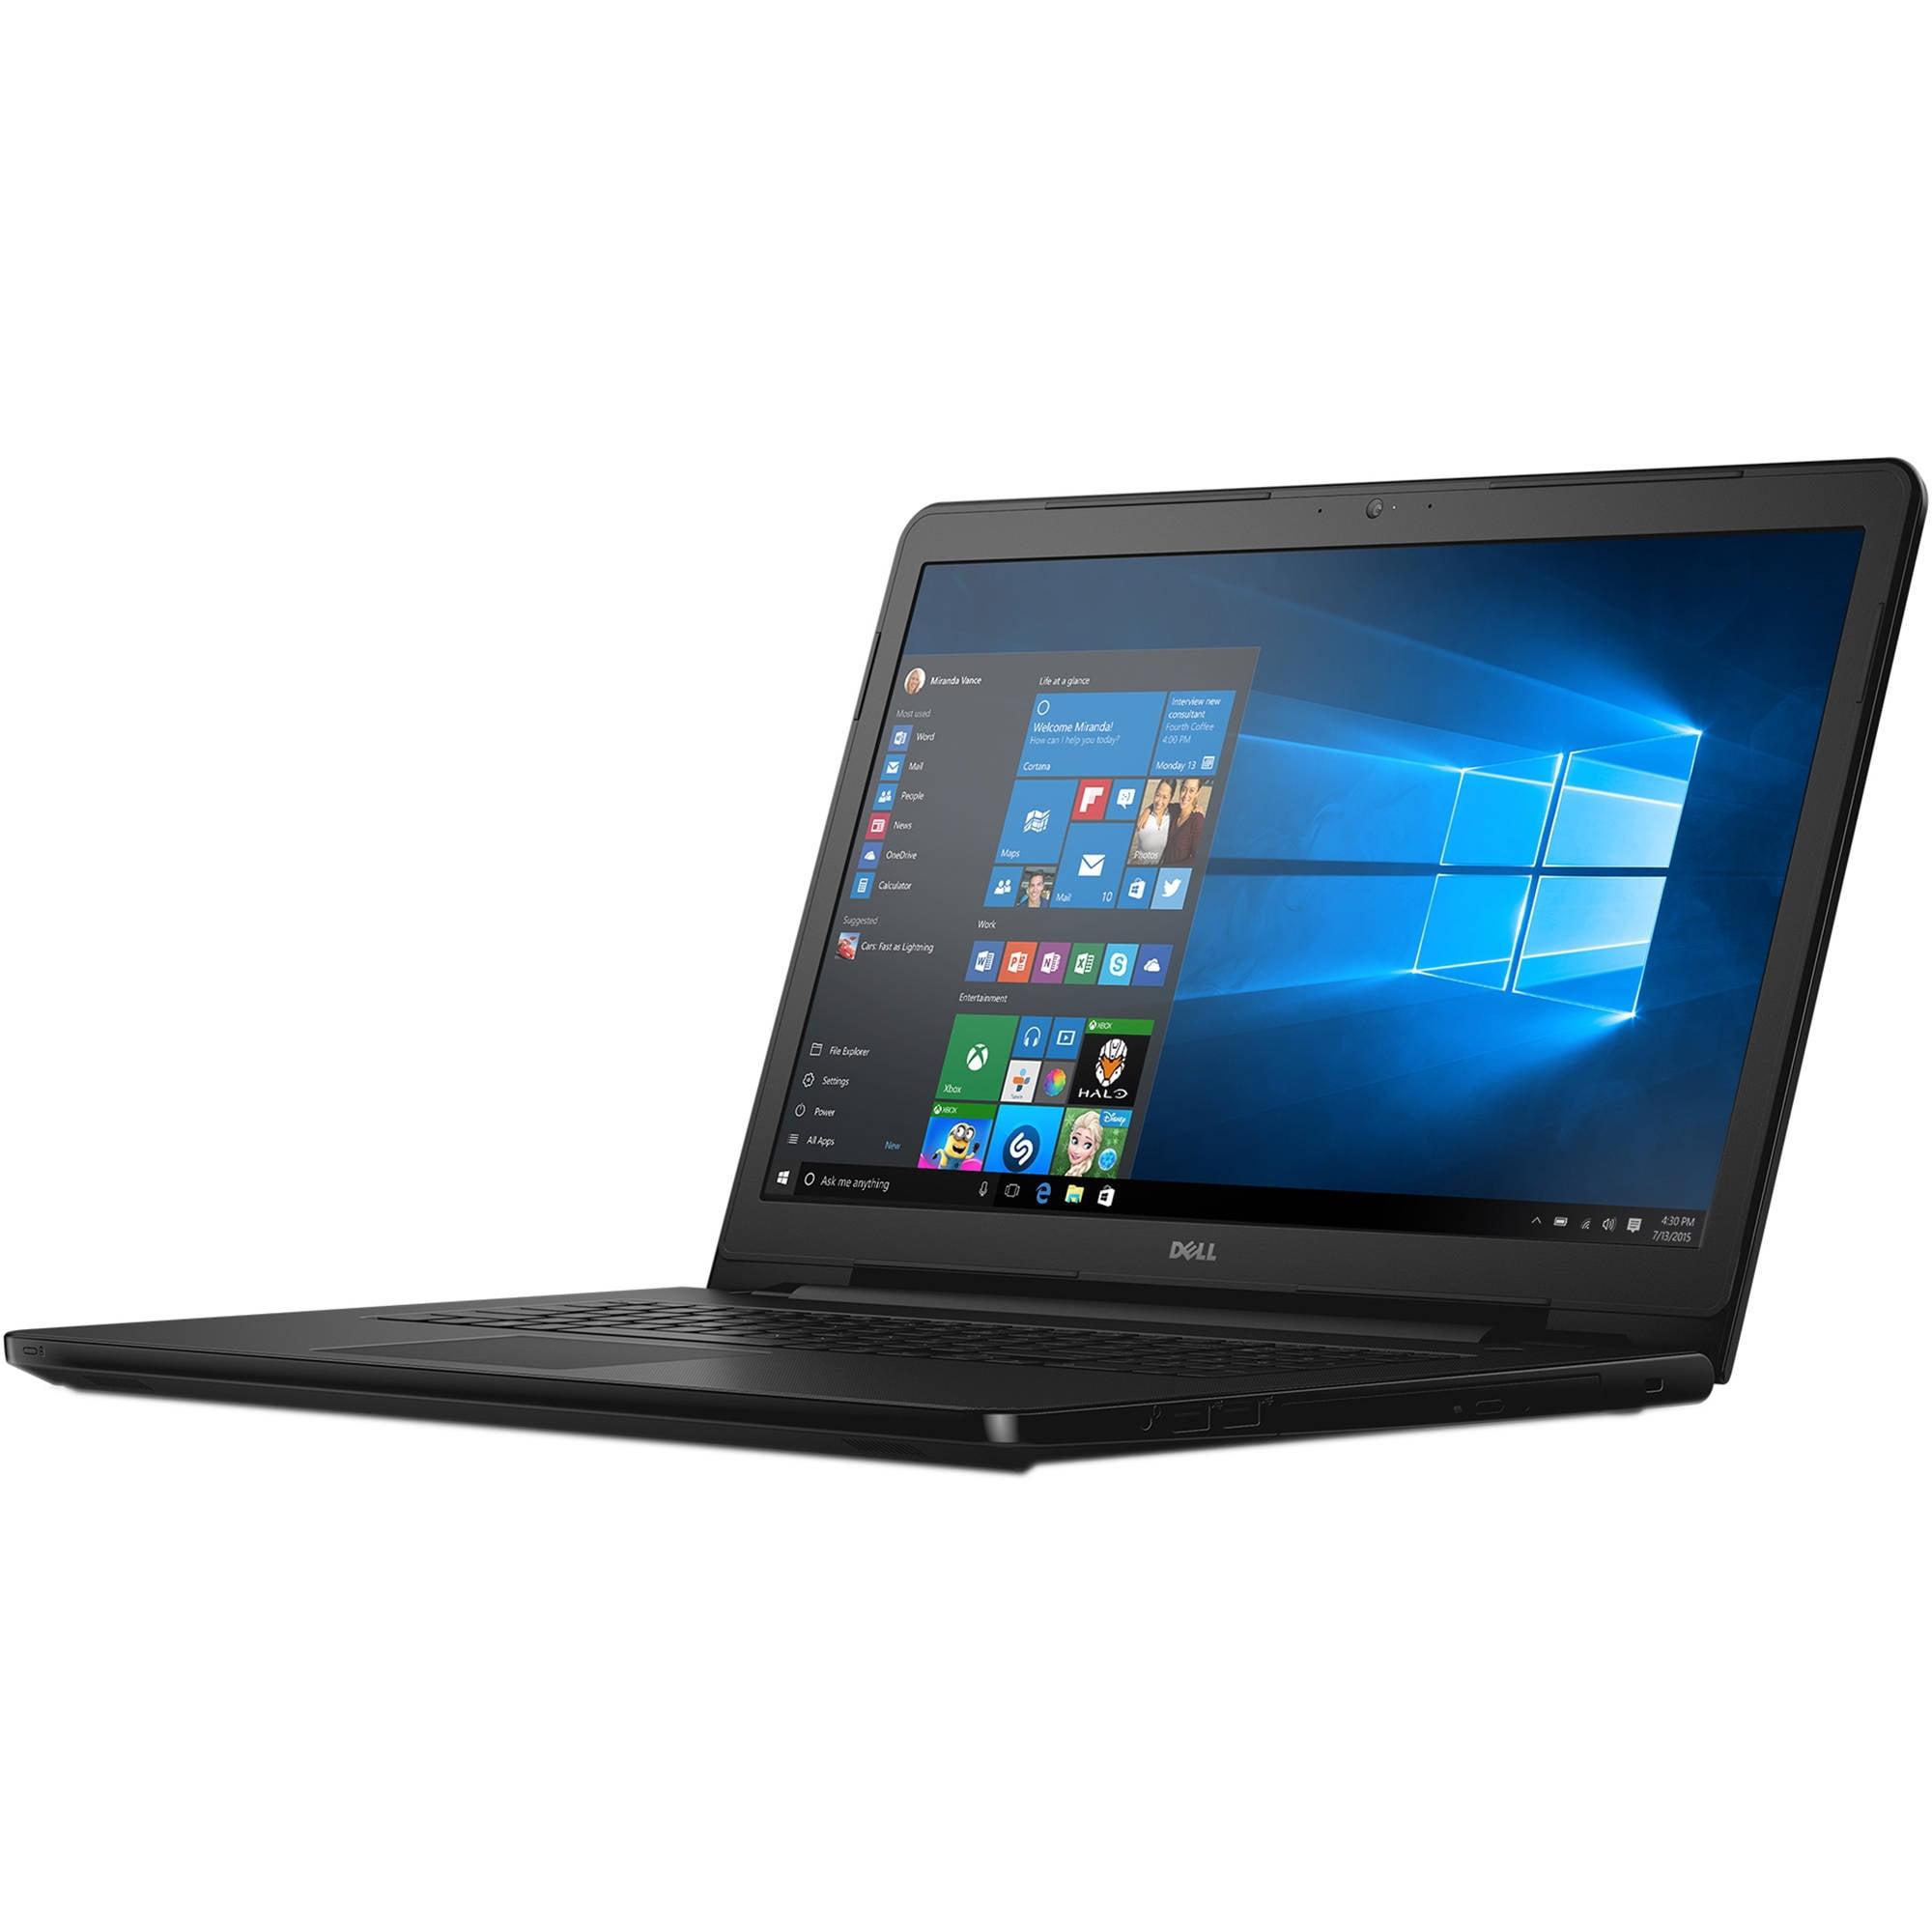 "Dell Inspiron 17-5759 Intel Core i3-6100U X2 2.3GHz 4GB 500GB 17.3"" Win10,Black (Scratch And Dent Refurbished)"